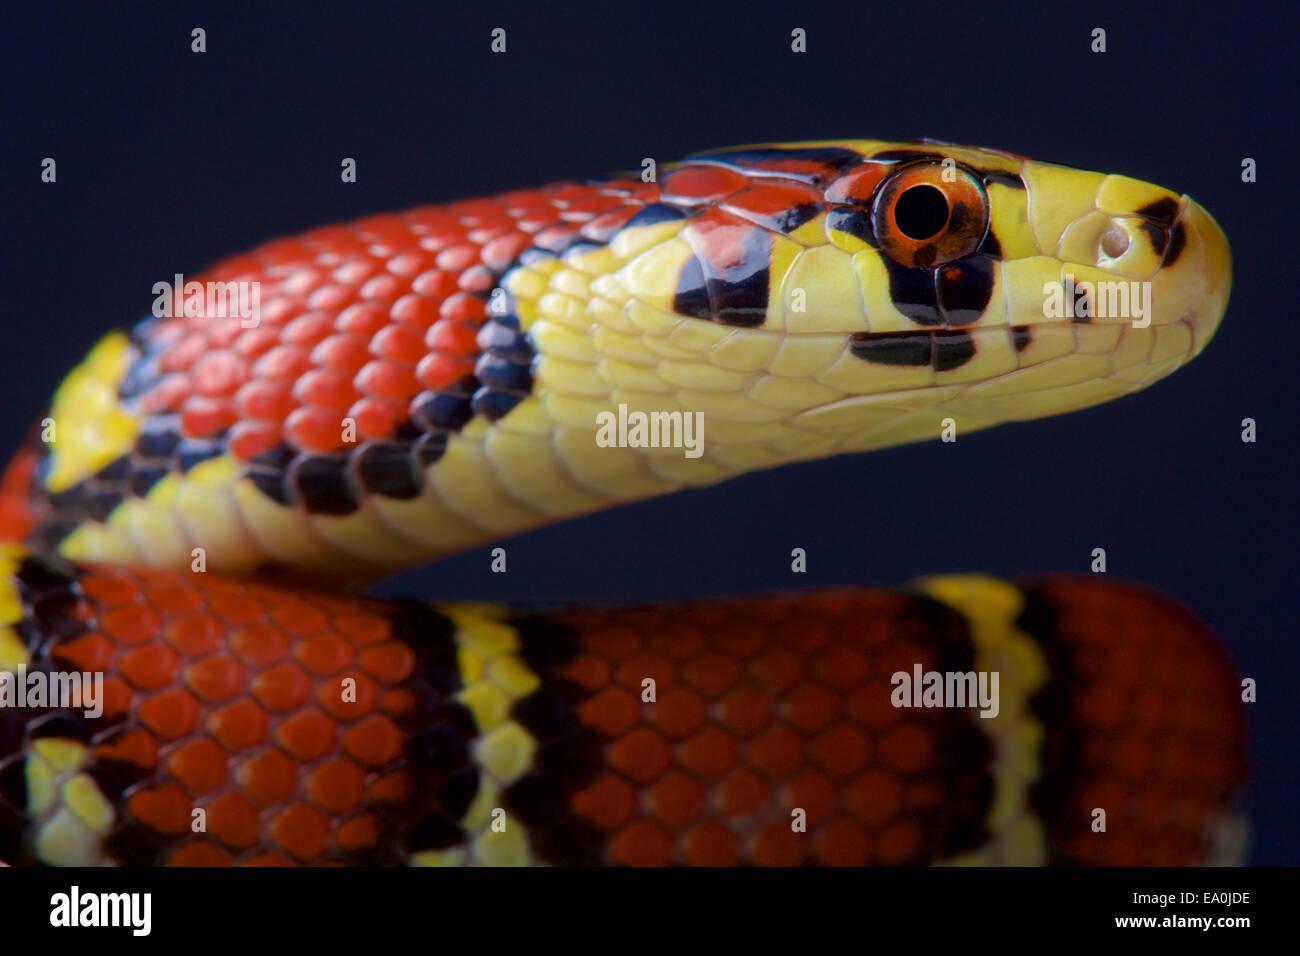 Couleuvre obscure / Archelaphe Chapa chapaensis bella Photo Stock